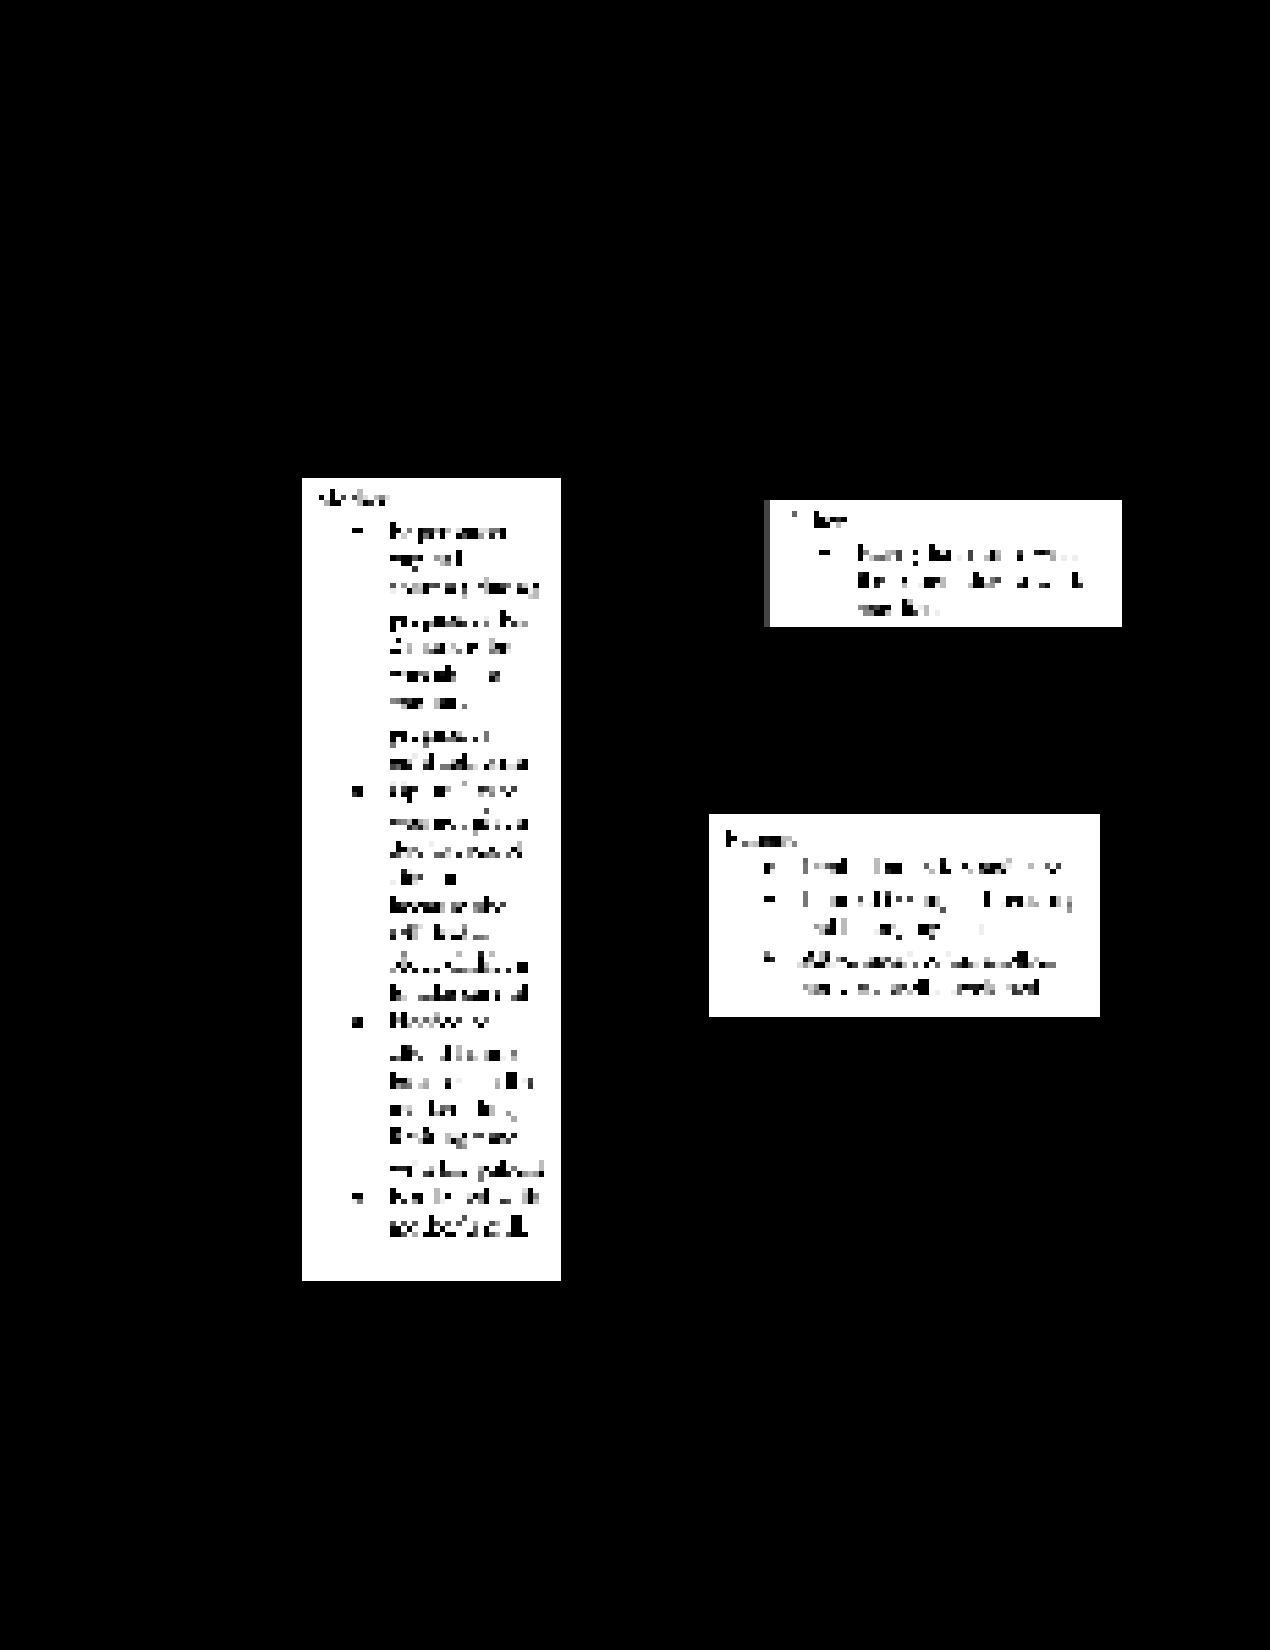 tata nano case study Tata nano submitted by :adhiraj sengupta - 907 amit kumar madaan - 911  arif masud – 918 avinash kumar – 920 chaman rai – 925 kushagra charan -.